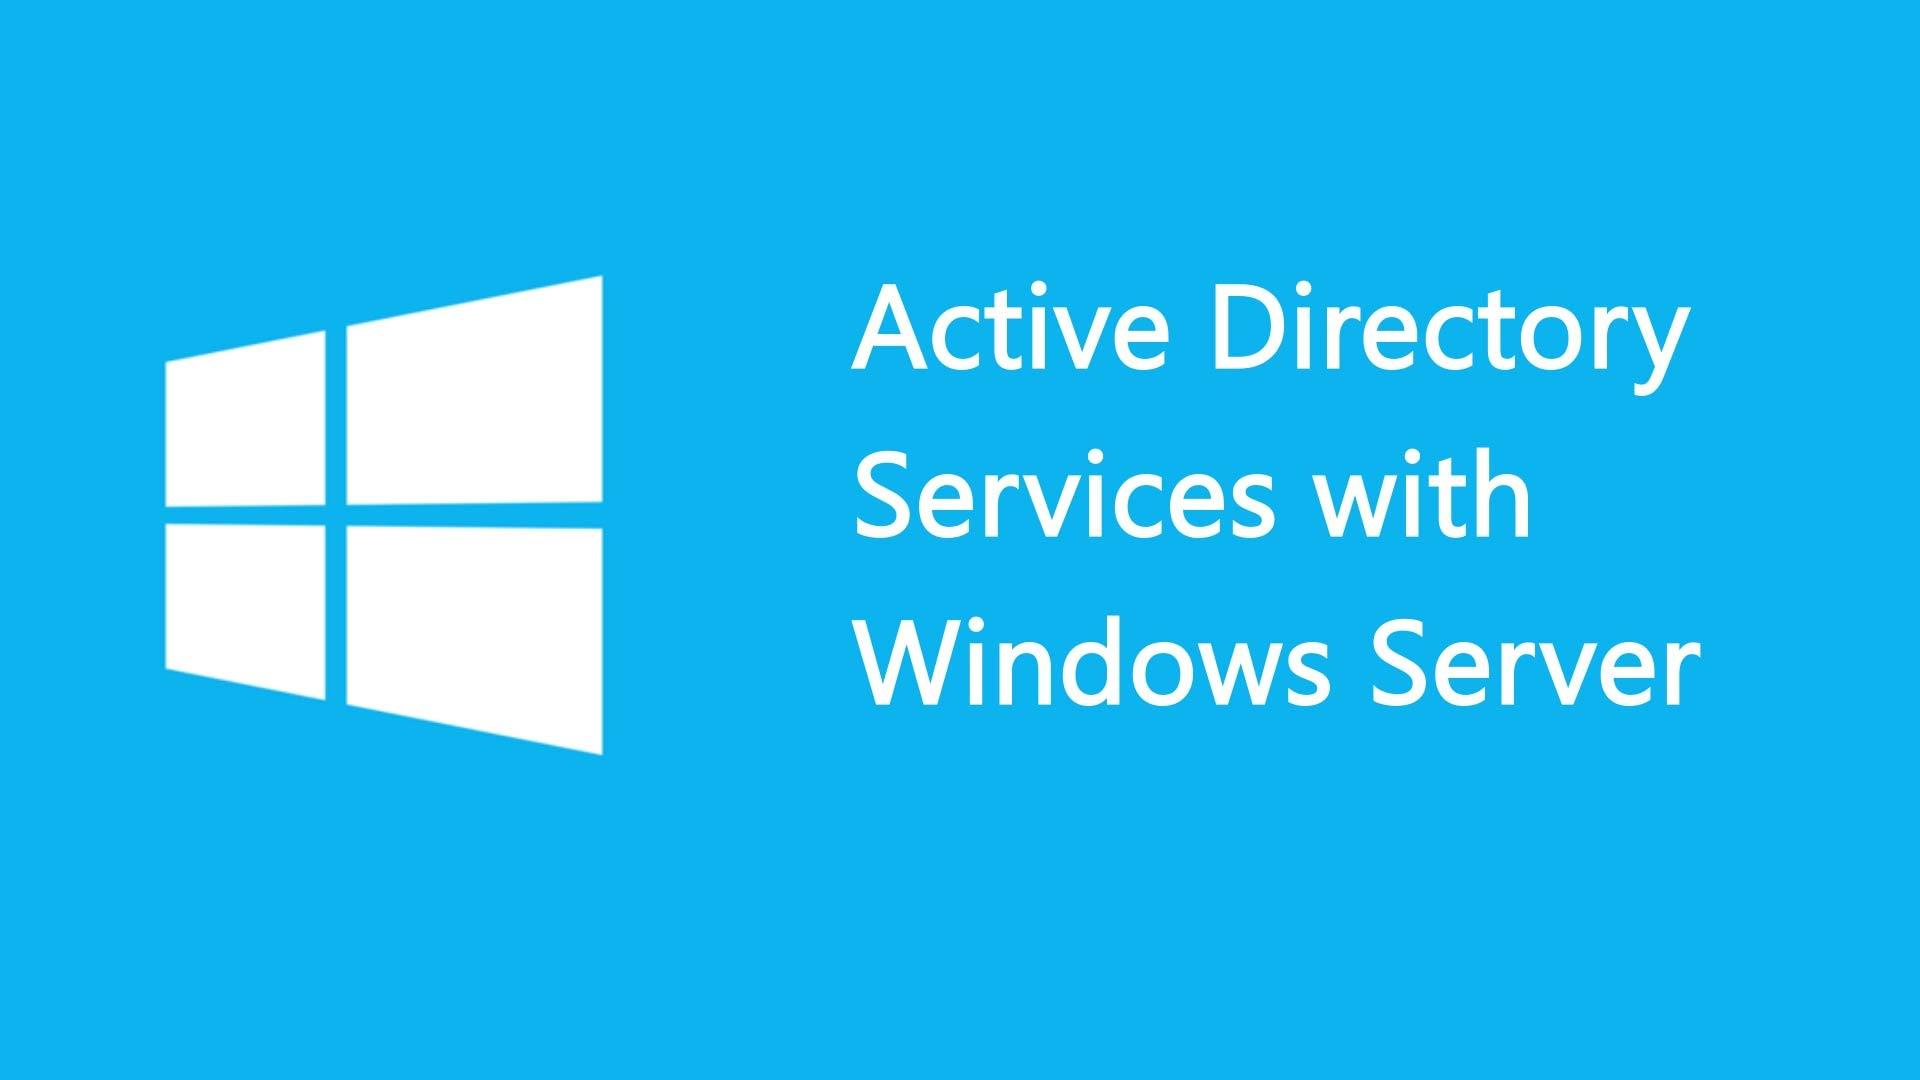 Настройка синхронизации времени в домене Active Directory